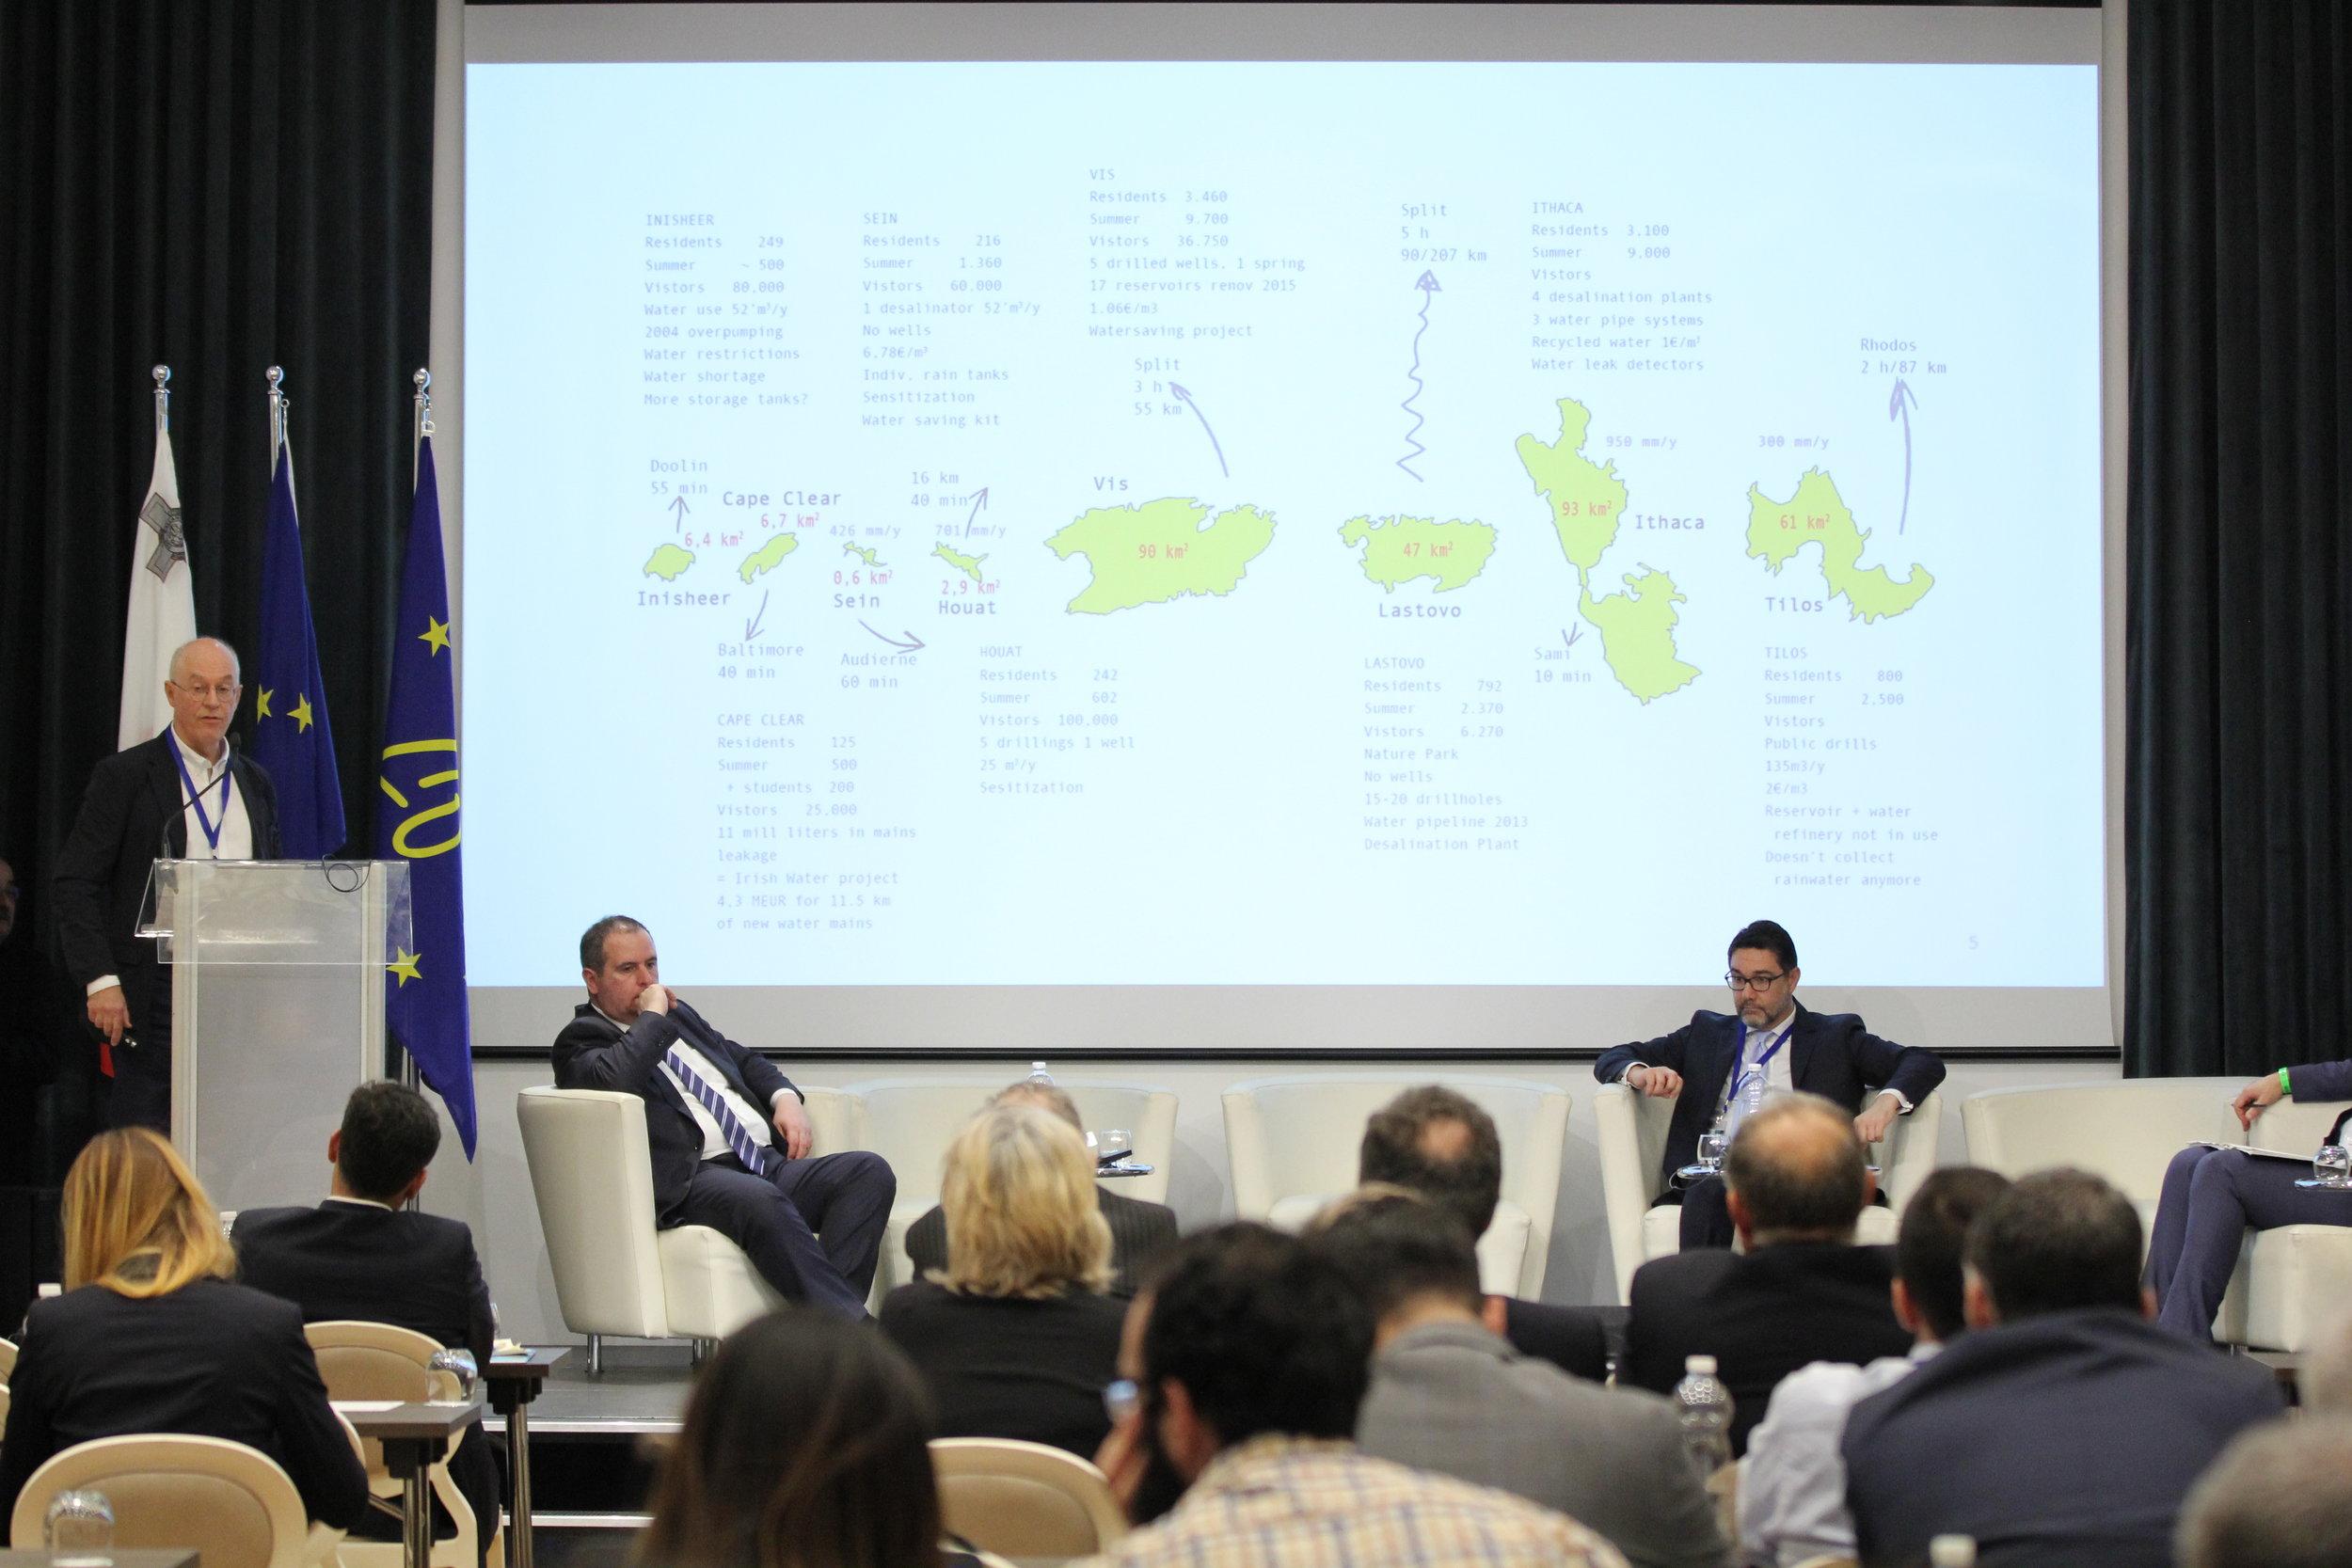 The 8 WASAC islands presented on Malta